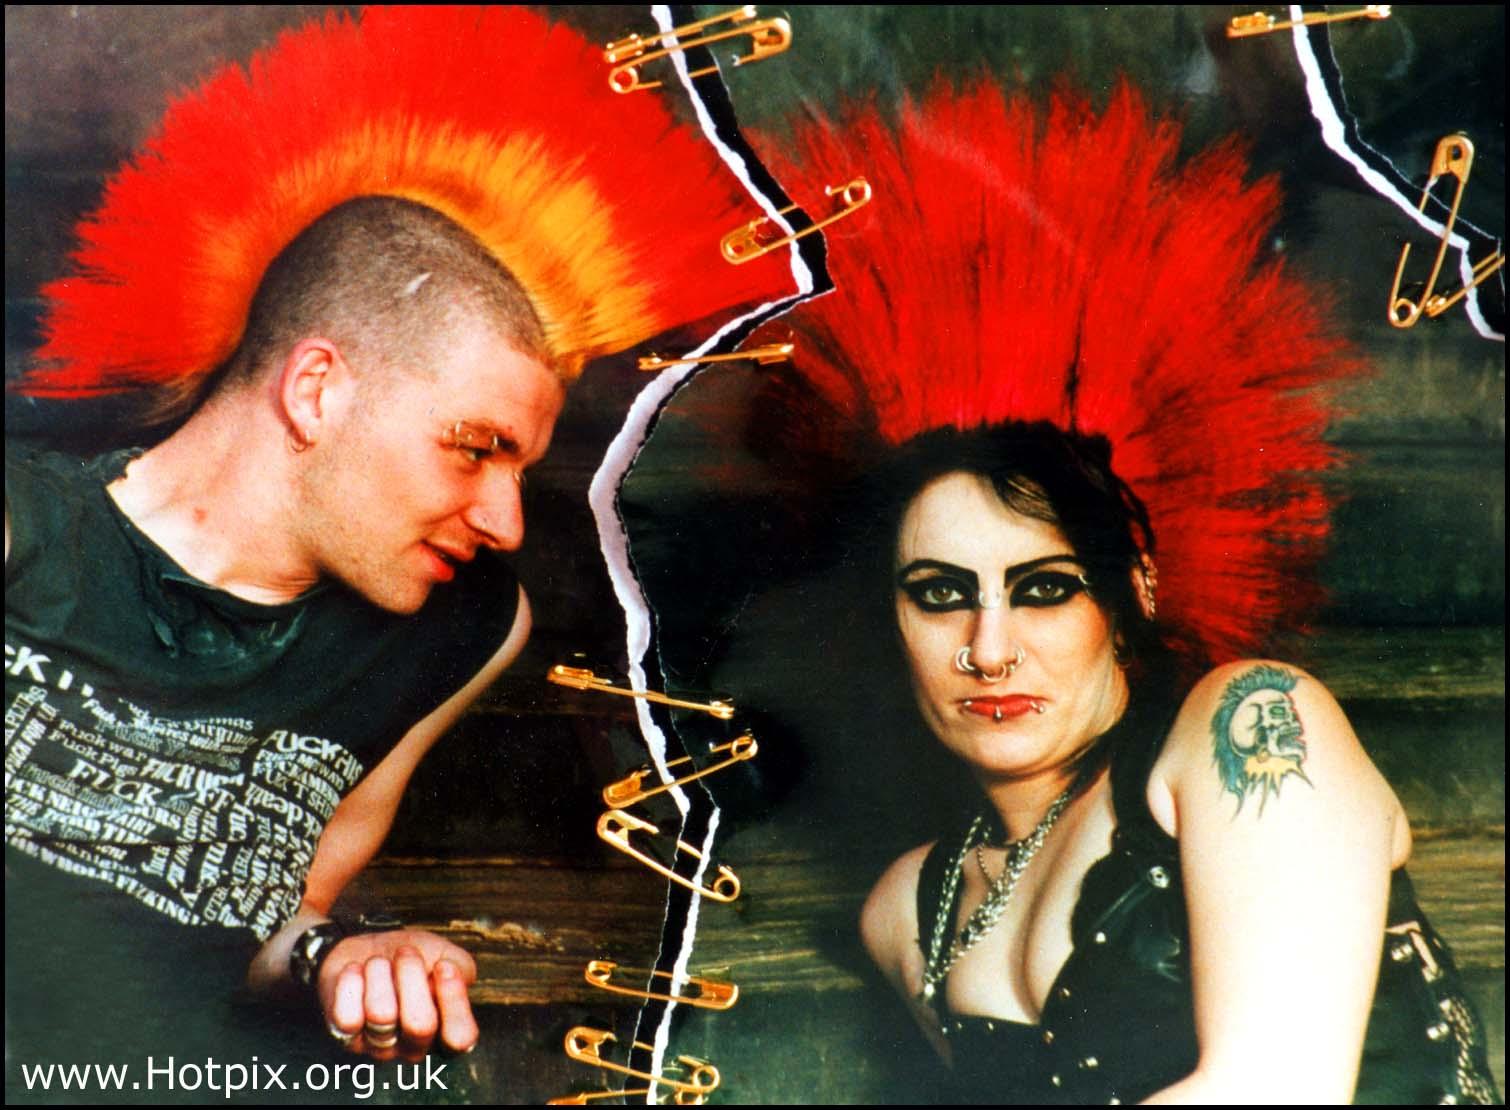 punx,punk,rock,rockers,music,mohawk,mo,hawk,mohechan,spiky,red,hair,pins,safety,leather,top,shaved,tattoo,tat2,pierce,piercings,england,britain,cheshire,stockport,yellow,sexy,fetish,eye,liner,eyeliner,brinnington,extreme,haircut,hairdo,Tatuaje,\u0442\u0430\u0442\u0443\u0438\u0440\u043e\u0432\u043a\u0430,T\u00e4towierung,tatouage,tatoegering,\u7d0b\u8eab\u82b1\u523a,tatoo,cool,person,people,portrait,image,tonysmith,tony,smith,Tatuada,tatto,tats,ink,bodyart,body,art,dark,disturbia,interesting,persons,persona,interesante,arty,sex,HOT PIX,retro,sensual,hotpicks,@hotpixuk